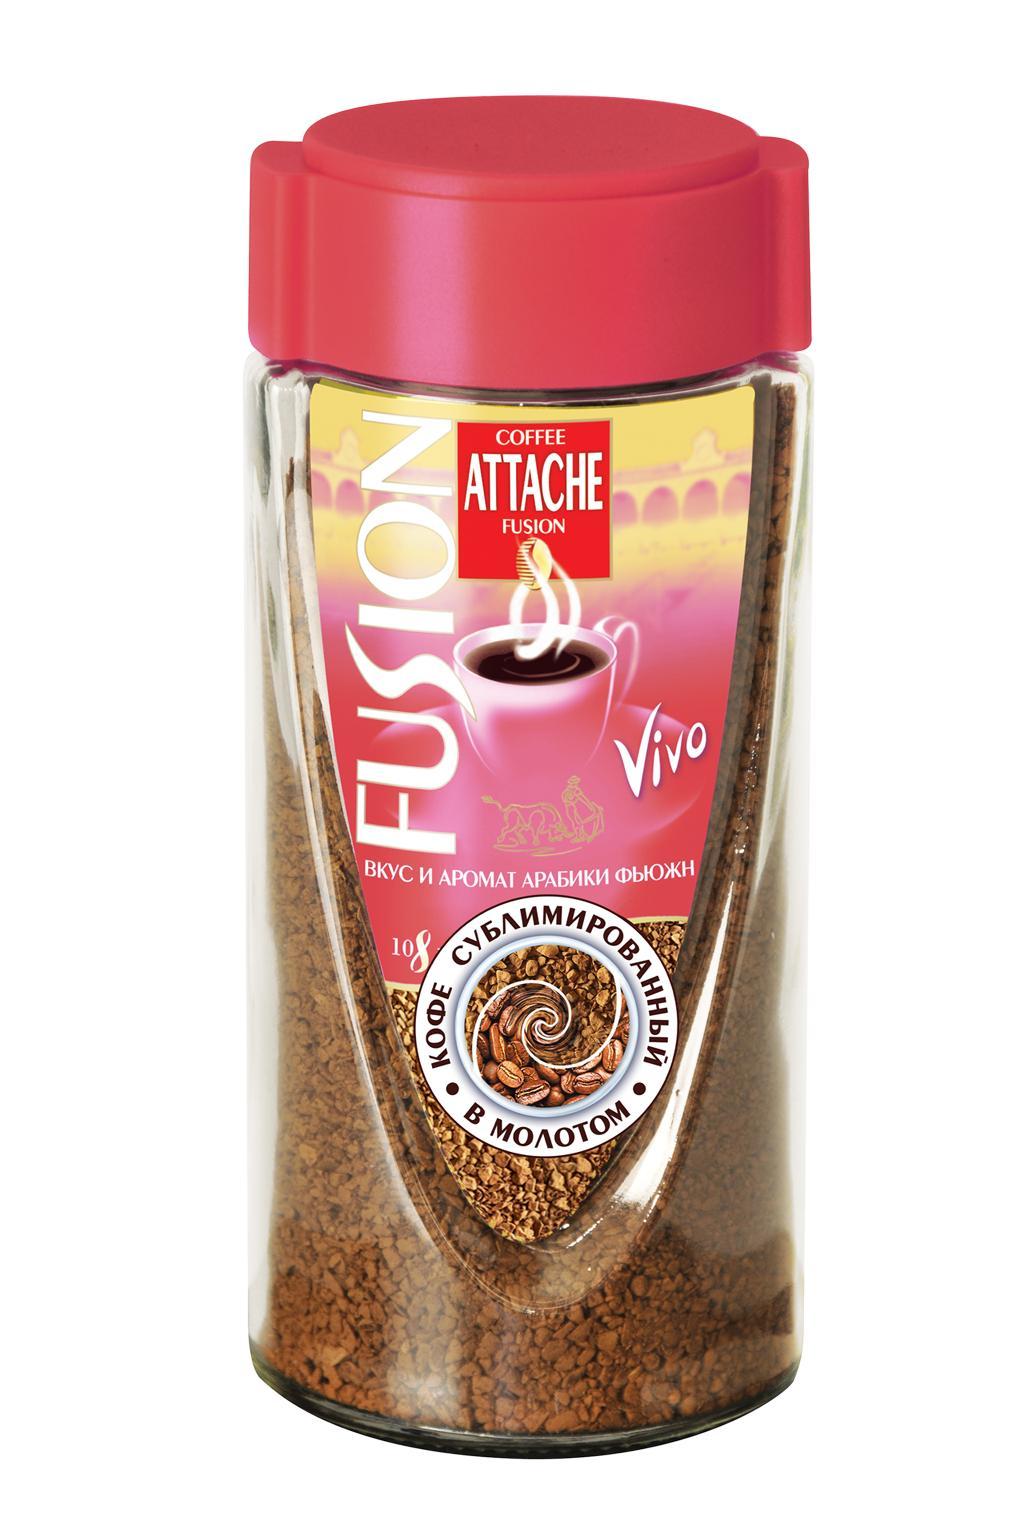 Кофе Attache Fusion Vivo растворимый 108 гр.